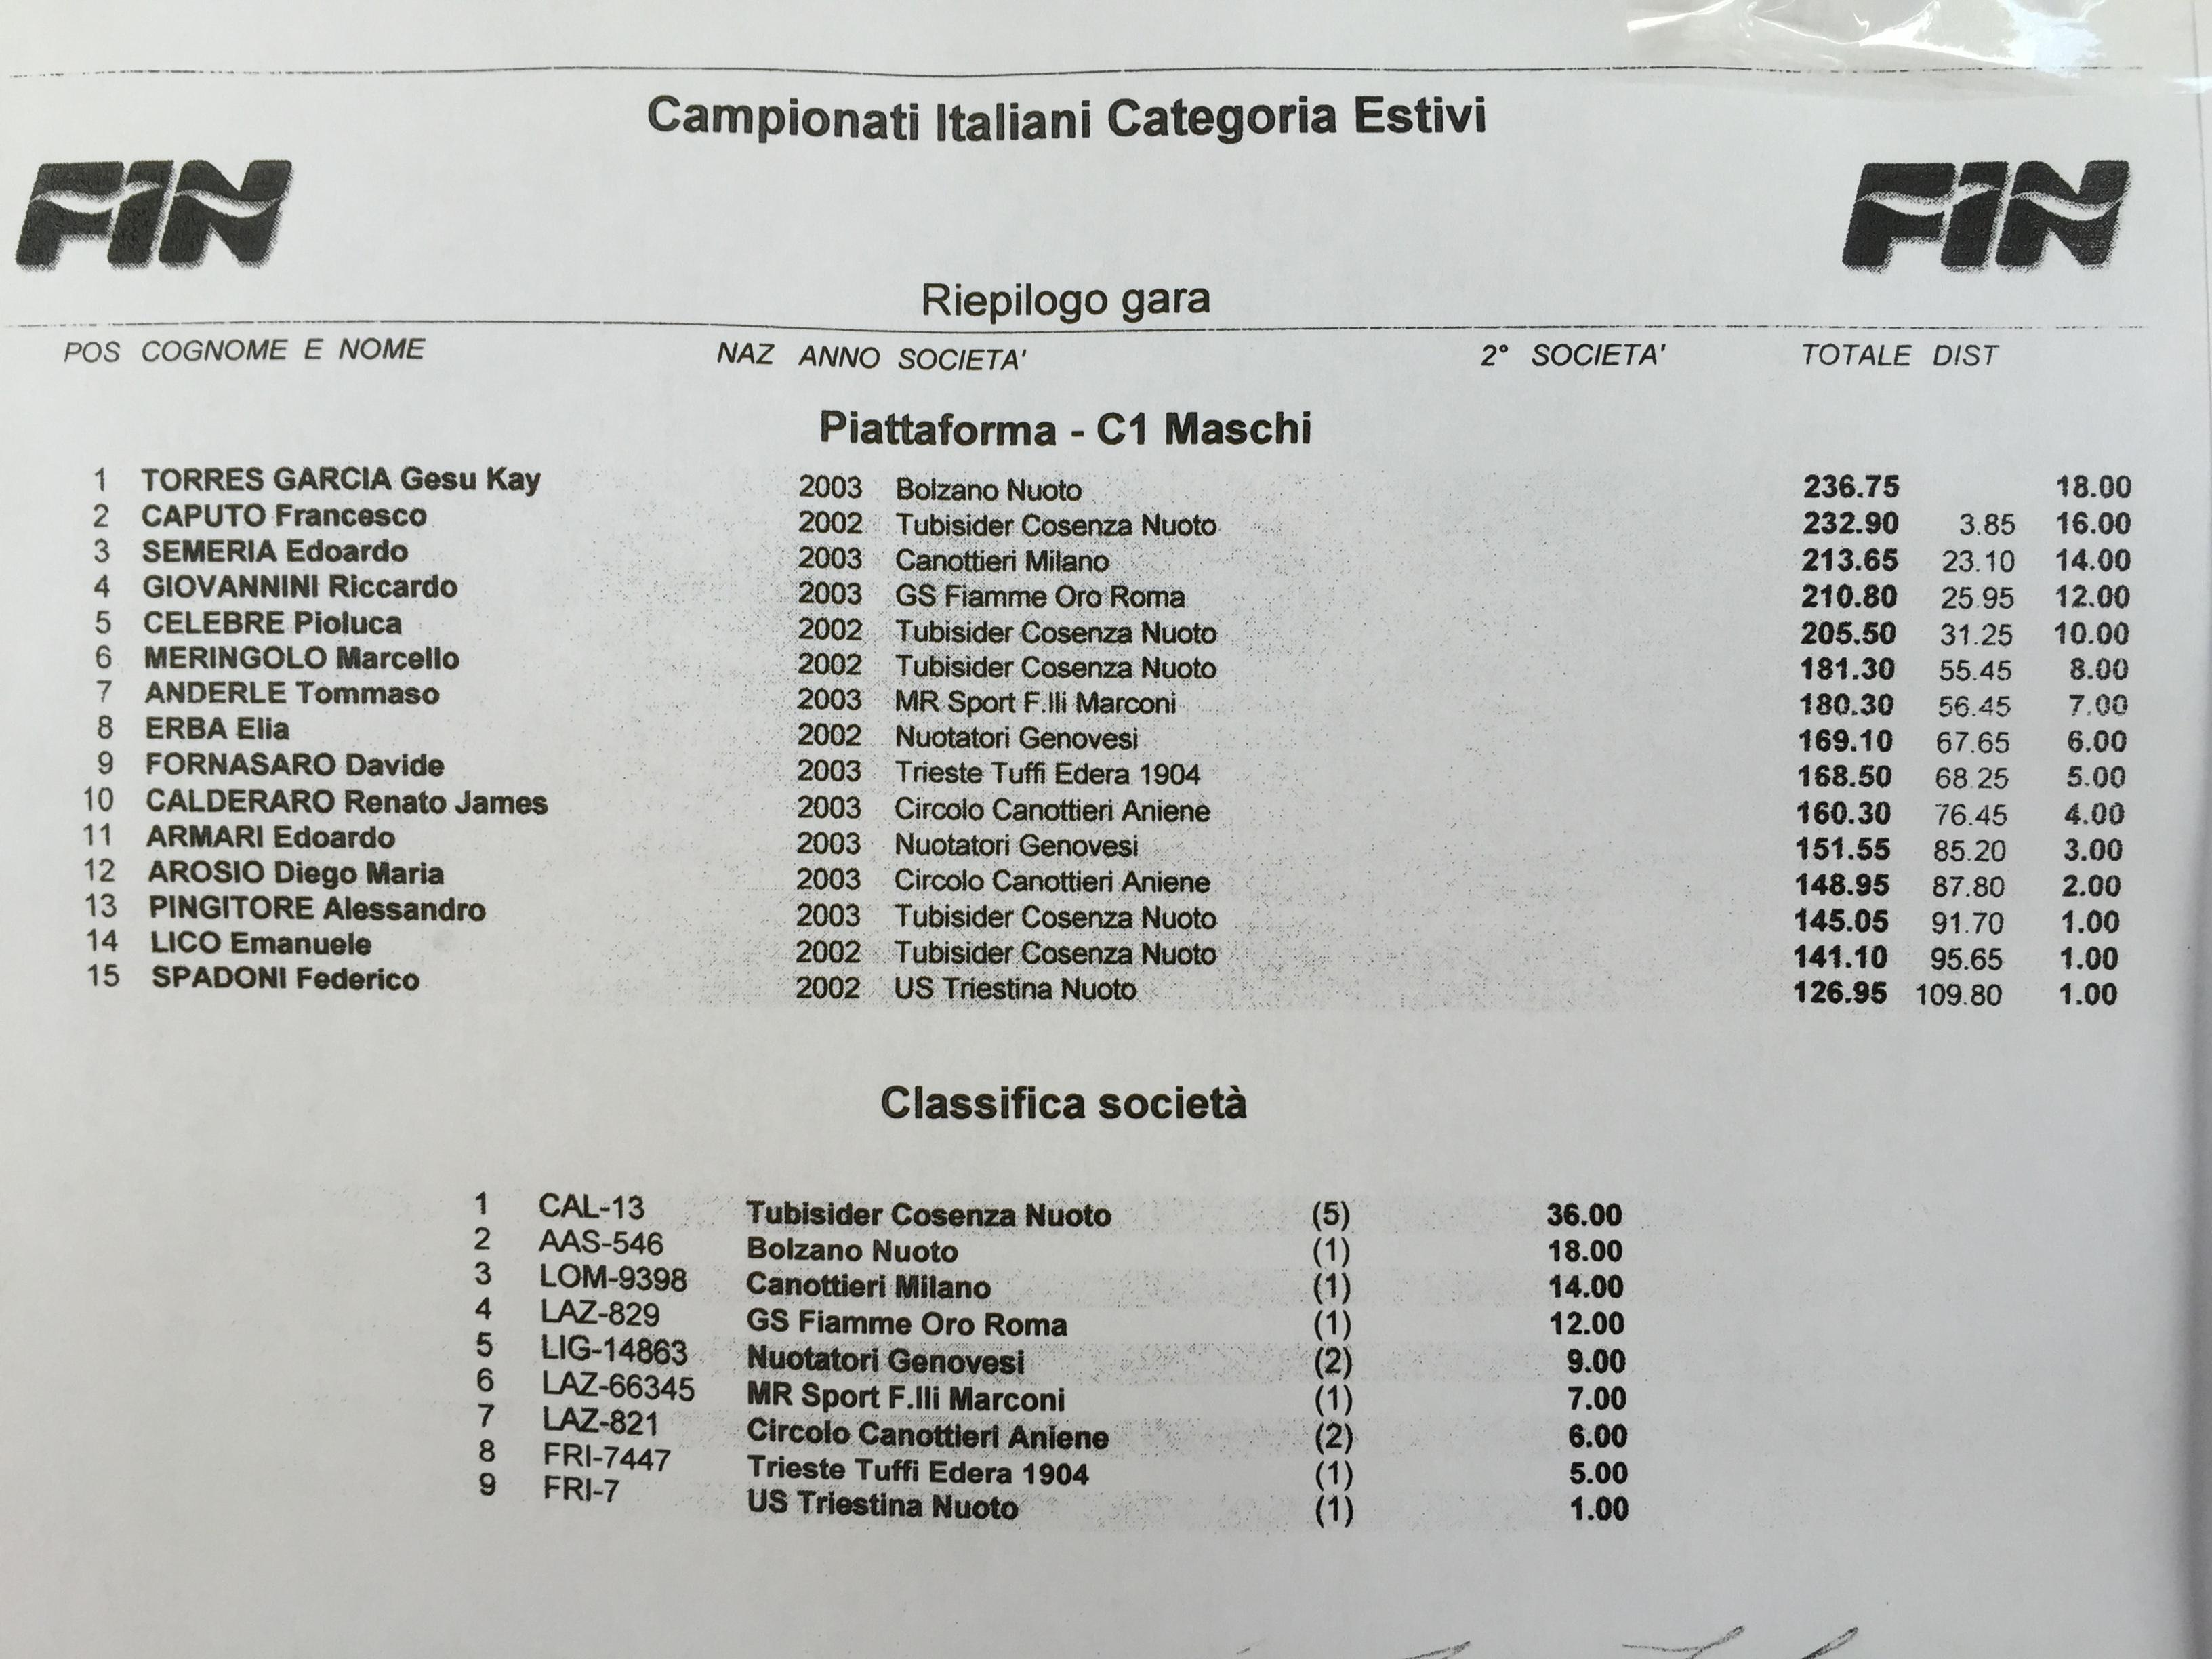 Categoria Estivi 2015 piatta C1 maschi